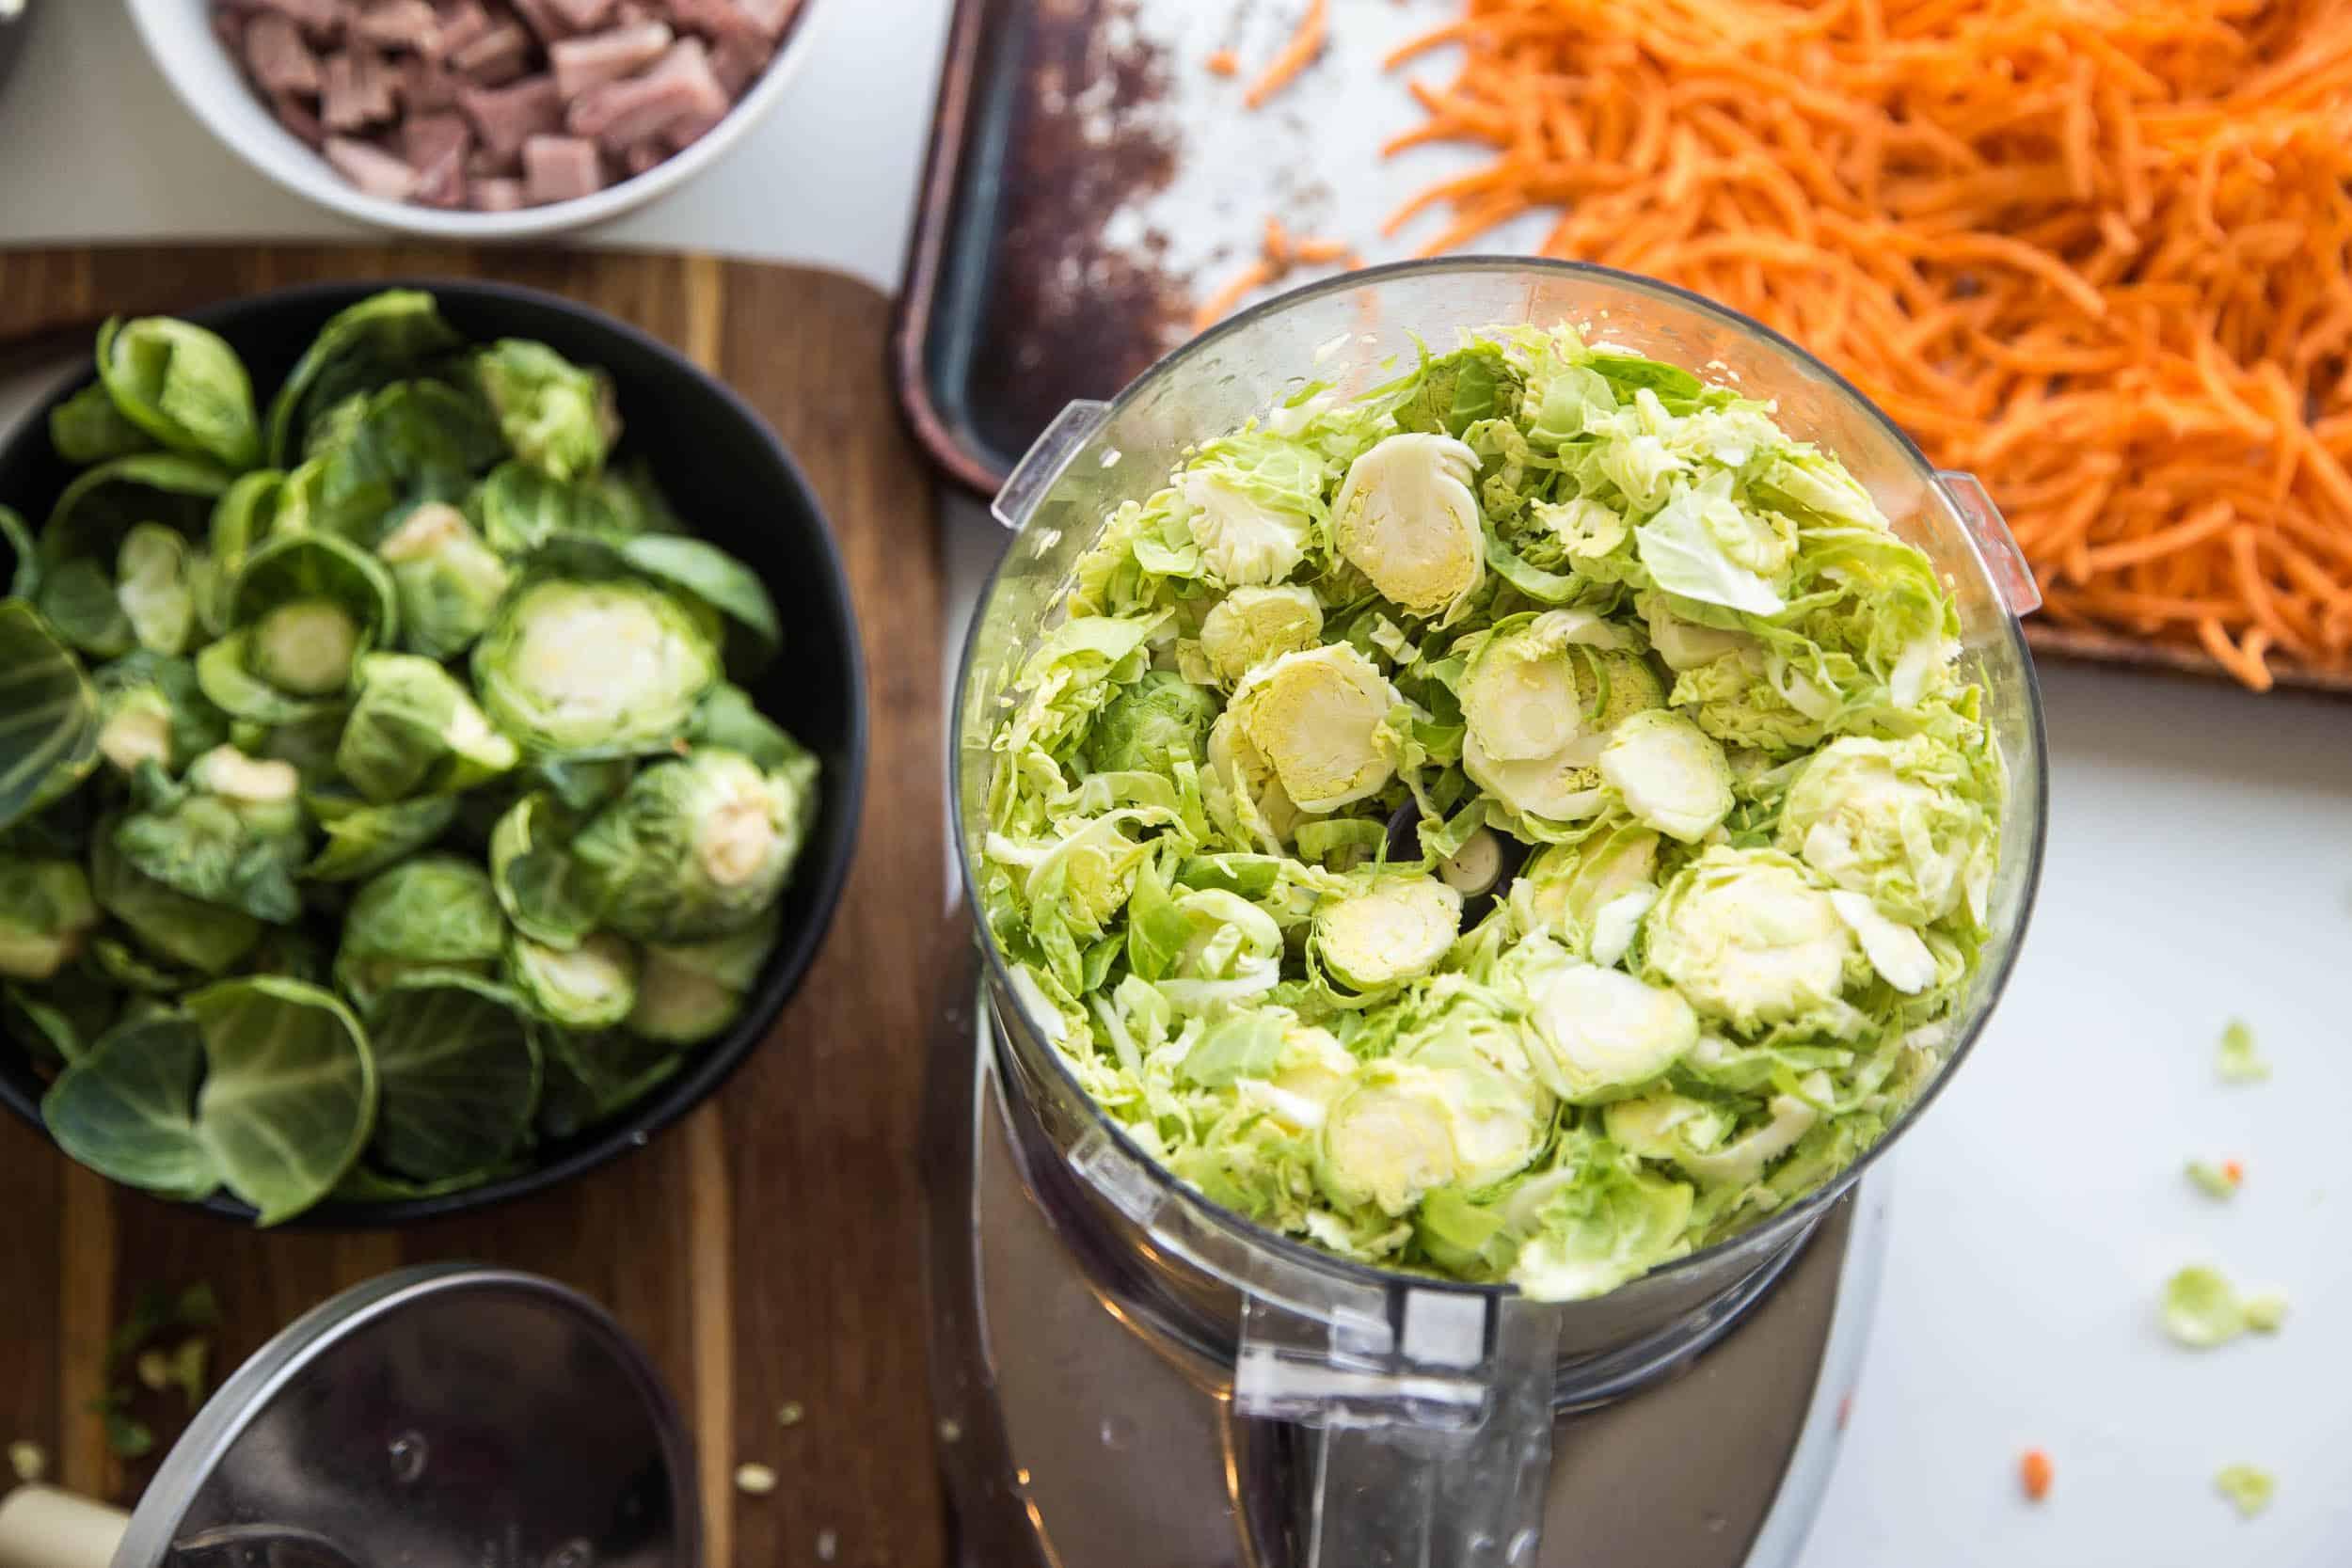 Roasted Ham & Shredded Brussels Sprout Hash | paleo recipes | breakfast recipes | leftover ham recipes | brunch recipes | gluten-free recipes | dairy-free recipes | perrysplate.com